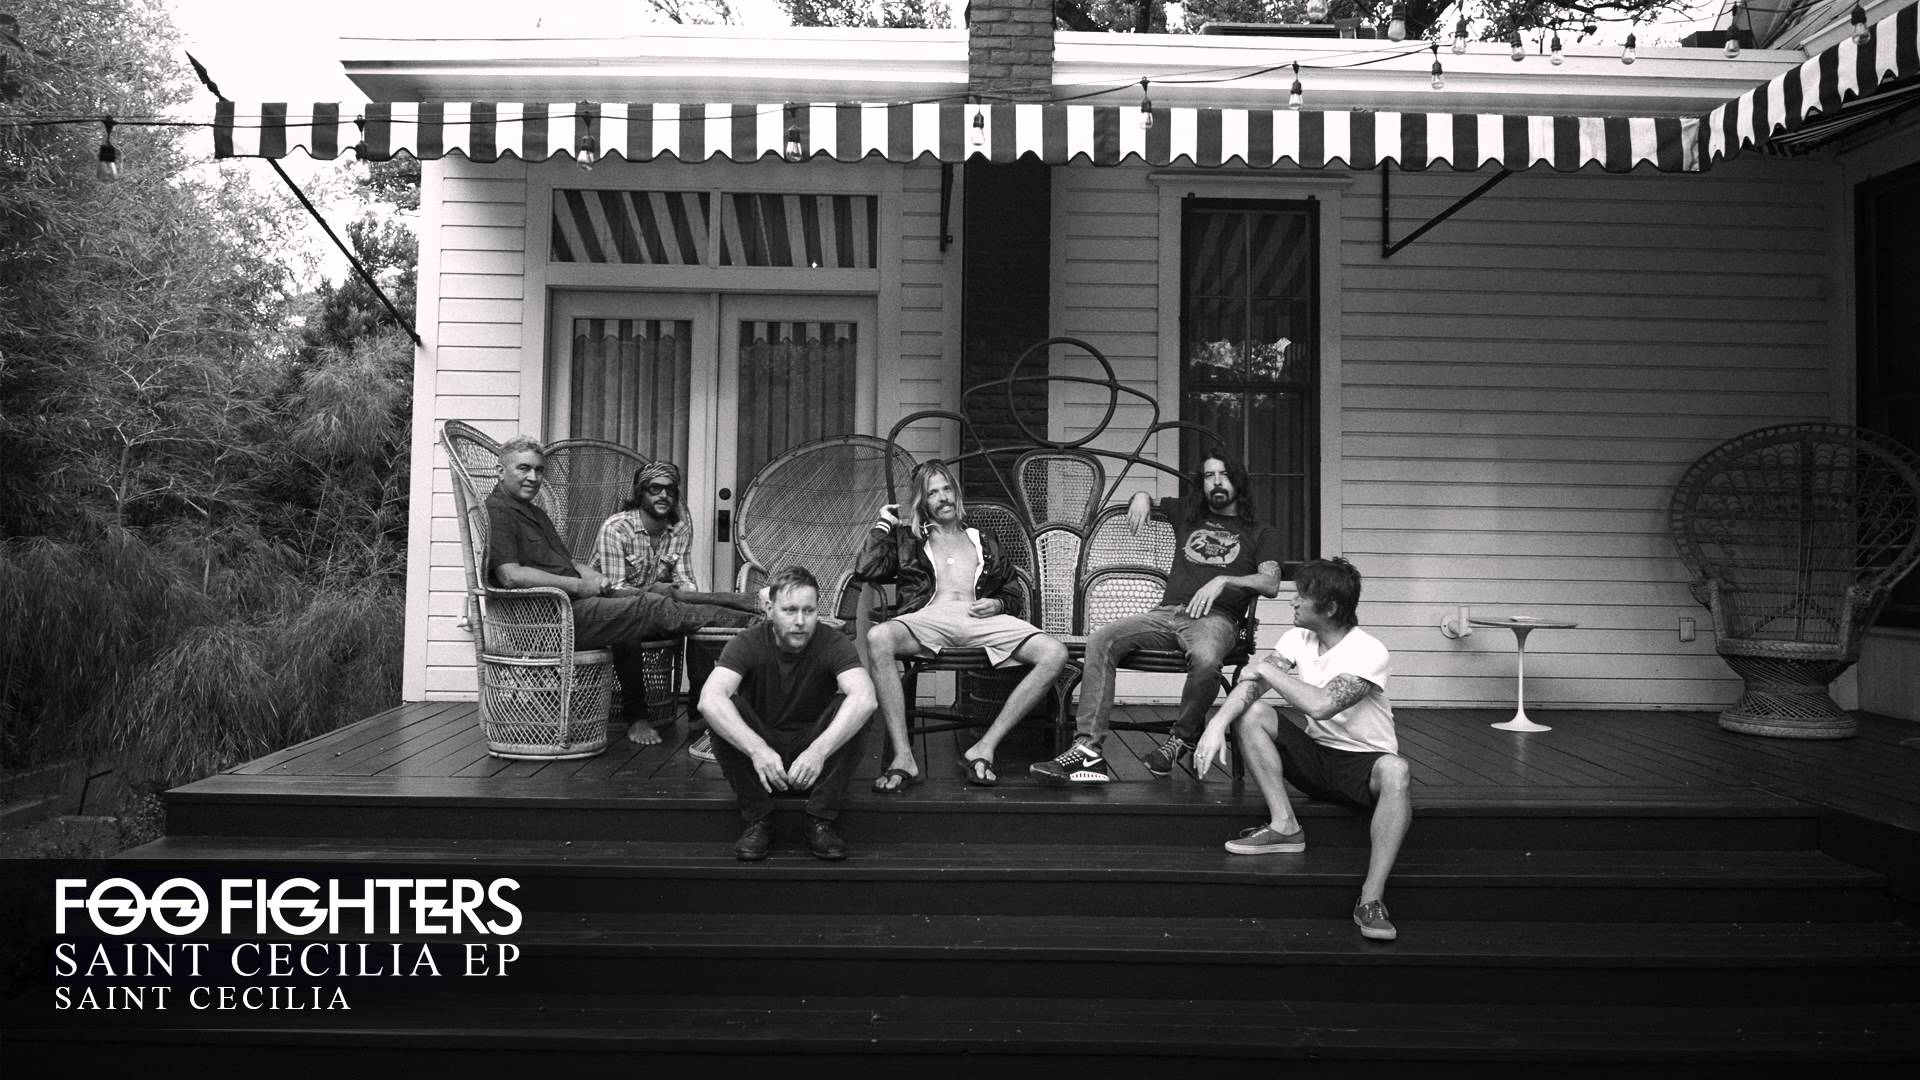 Foo Fighters - Saint Cecilia